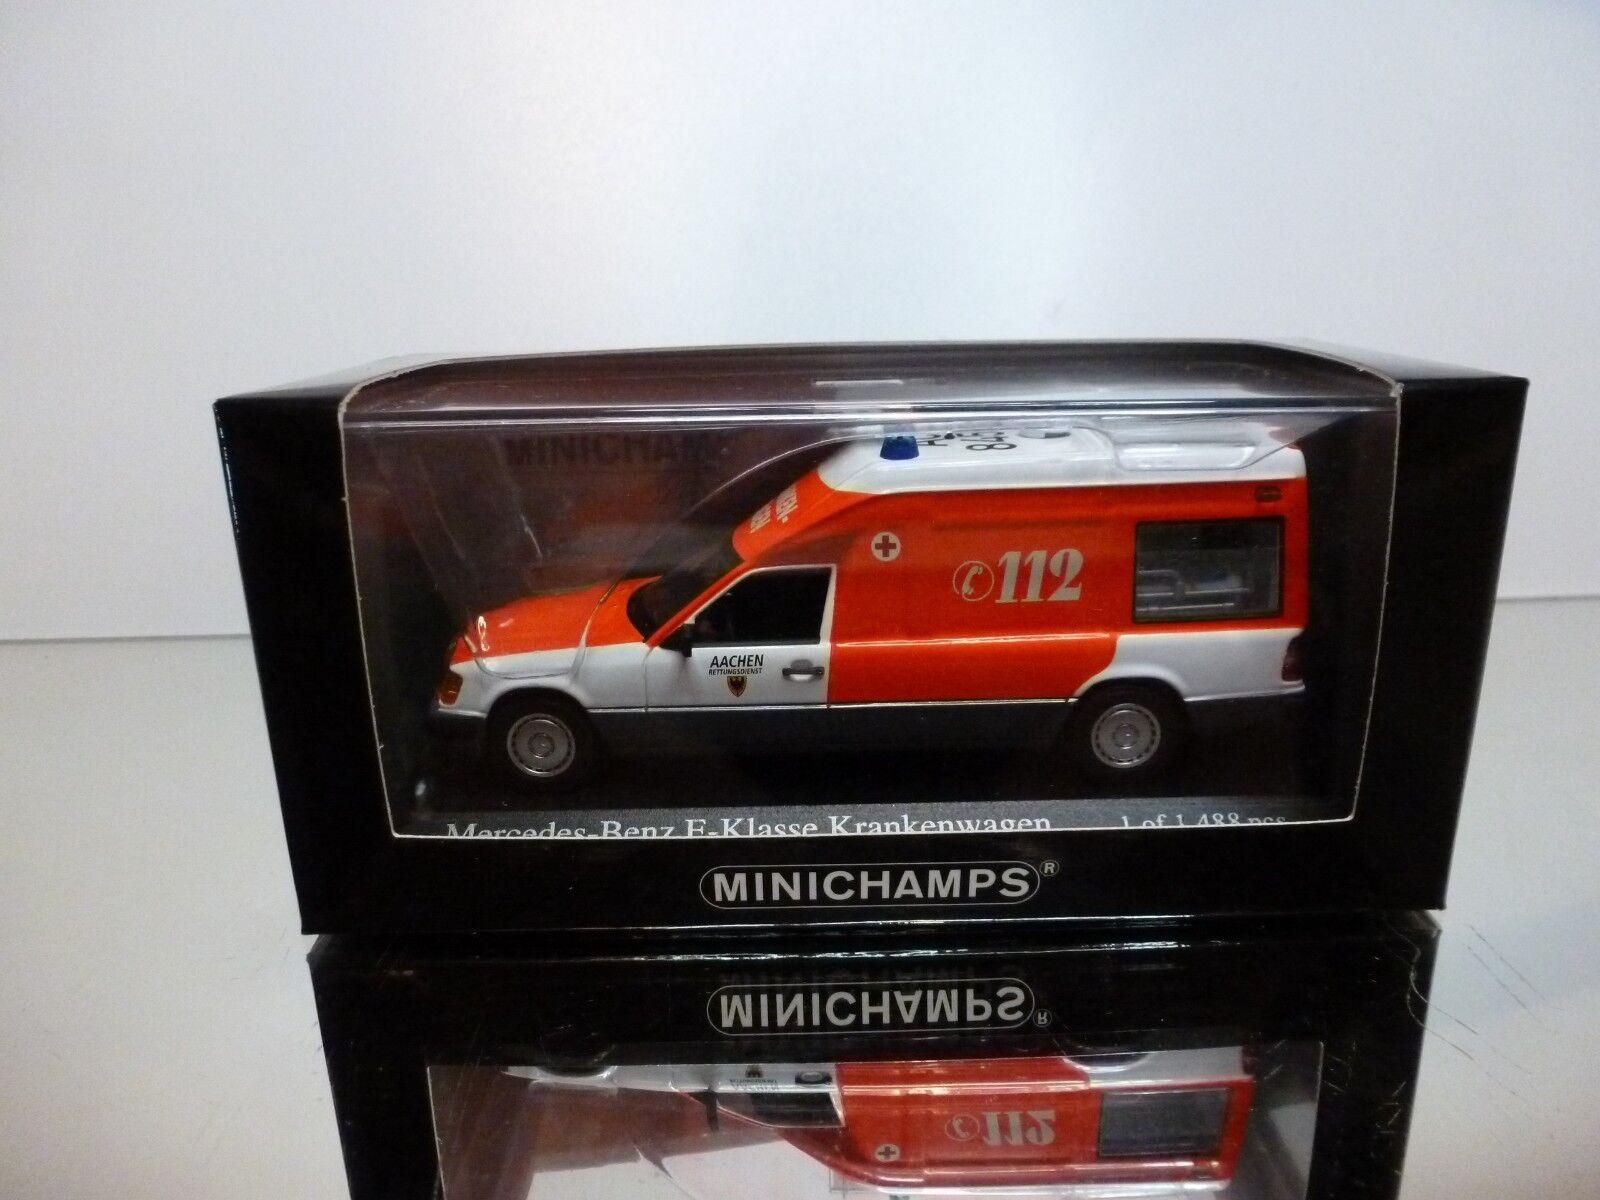 MINICHAMPS 37070 MERCEDES AMBULANCE AACHEN - PROMO 1 43 RARE - EXCELLENT IN BOX